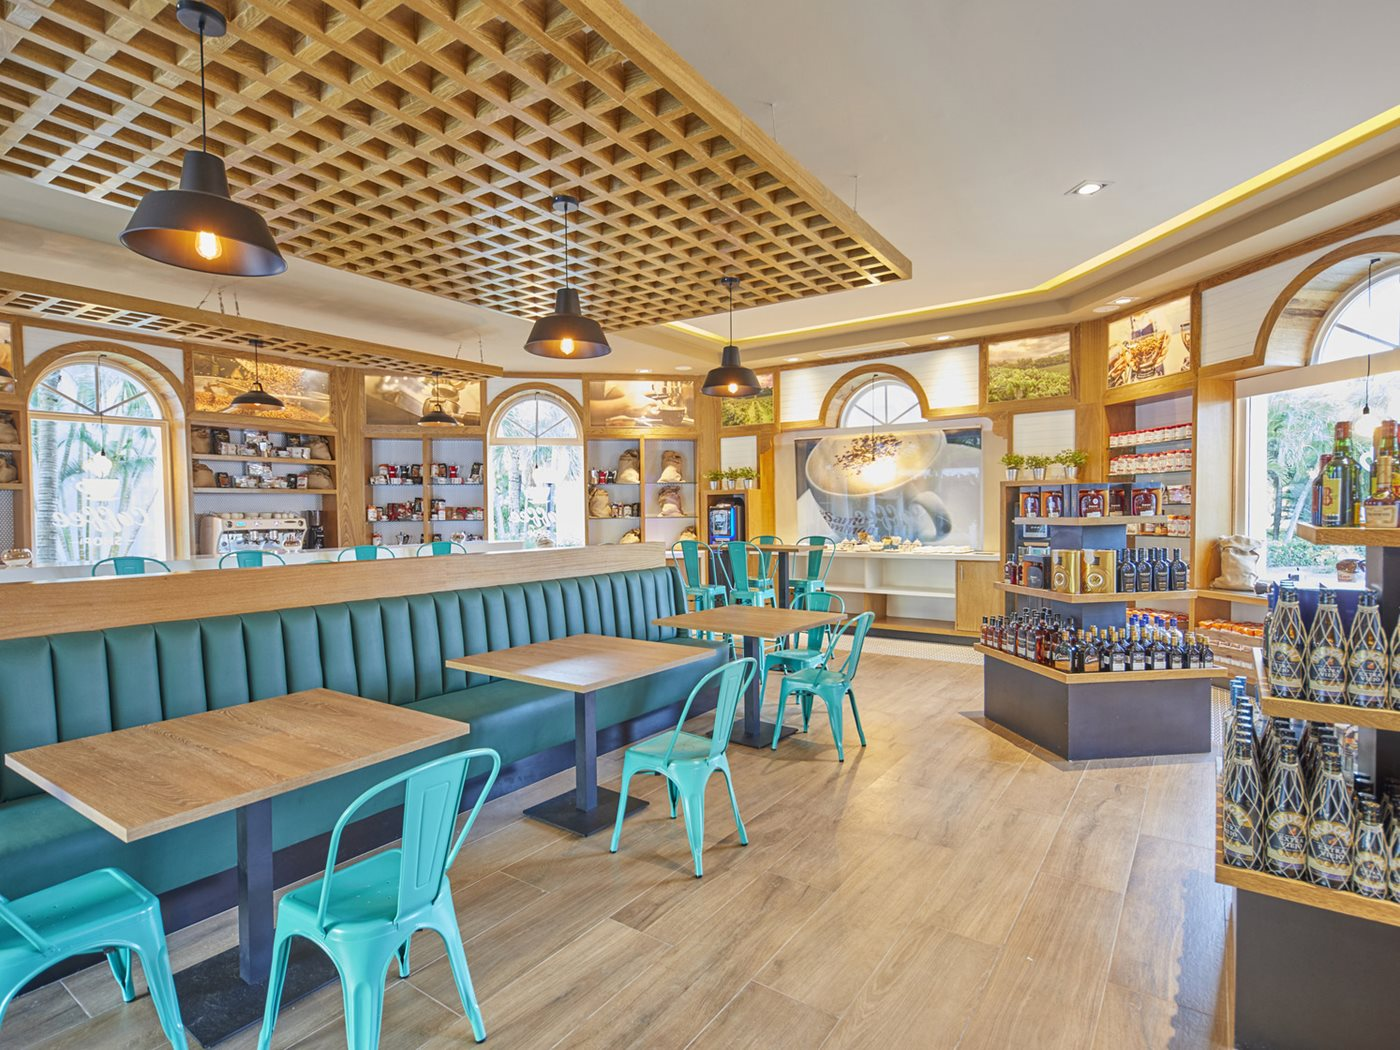 PUJ-Luxury-Bahia-Principe-Ambar-Bar-Coffee-Shop-001.jpeg